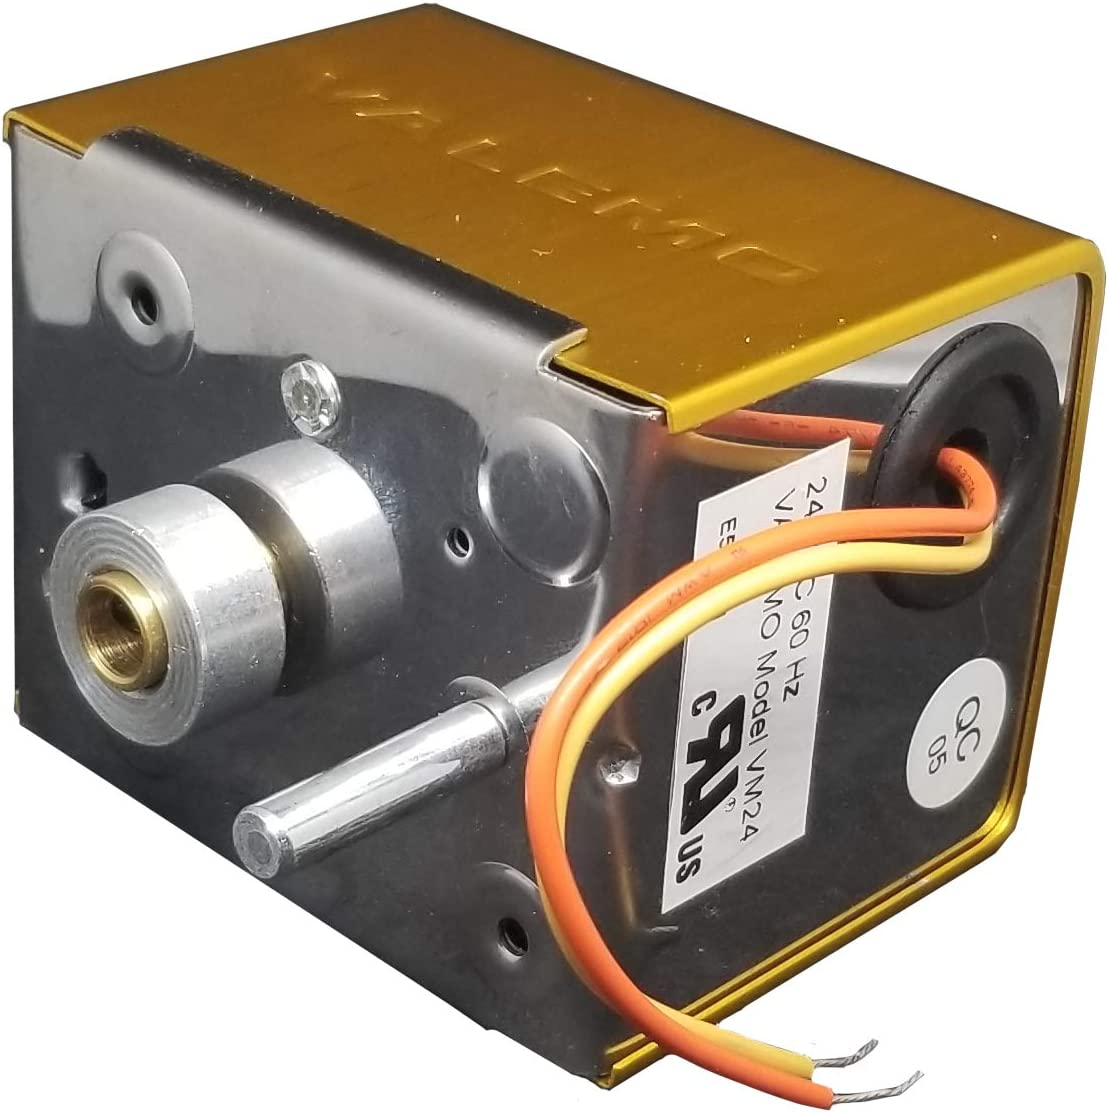 Valemo VDM10, Spring Return Damper Actuator & Motor, Replacement Damper Motor Actuator for Honeywell ARD ZD M847D & Similar Actuators, 24VAC, No Switch